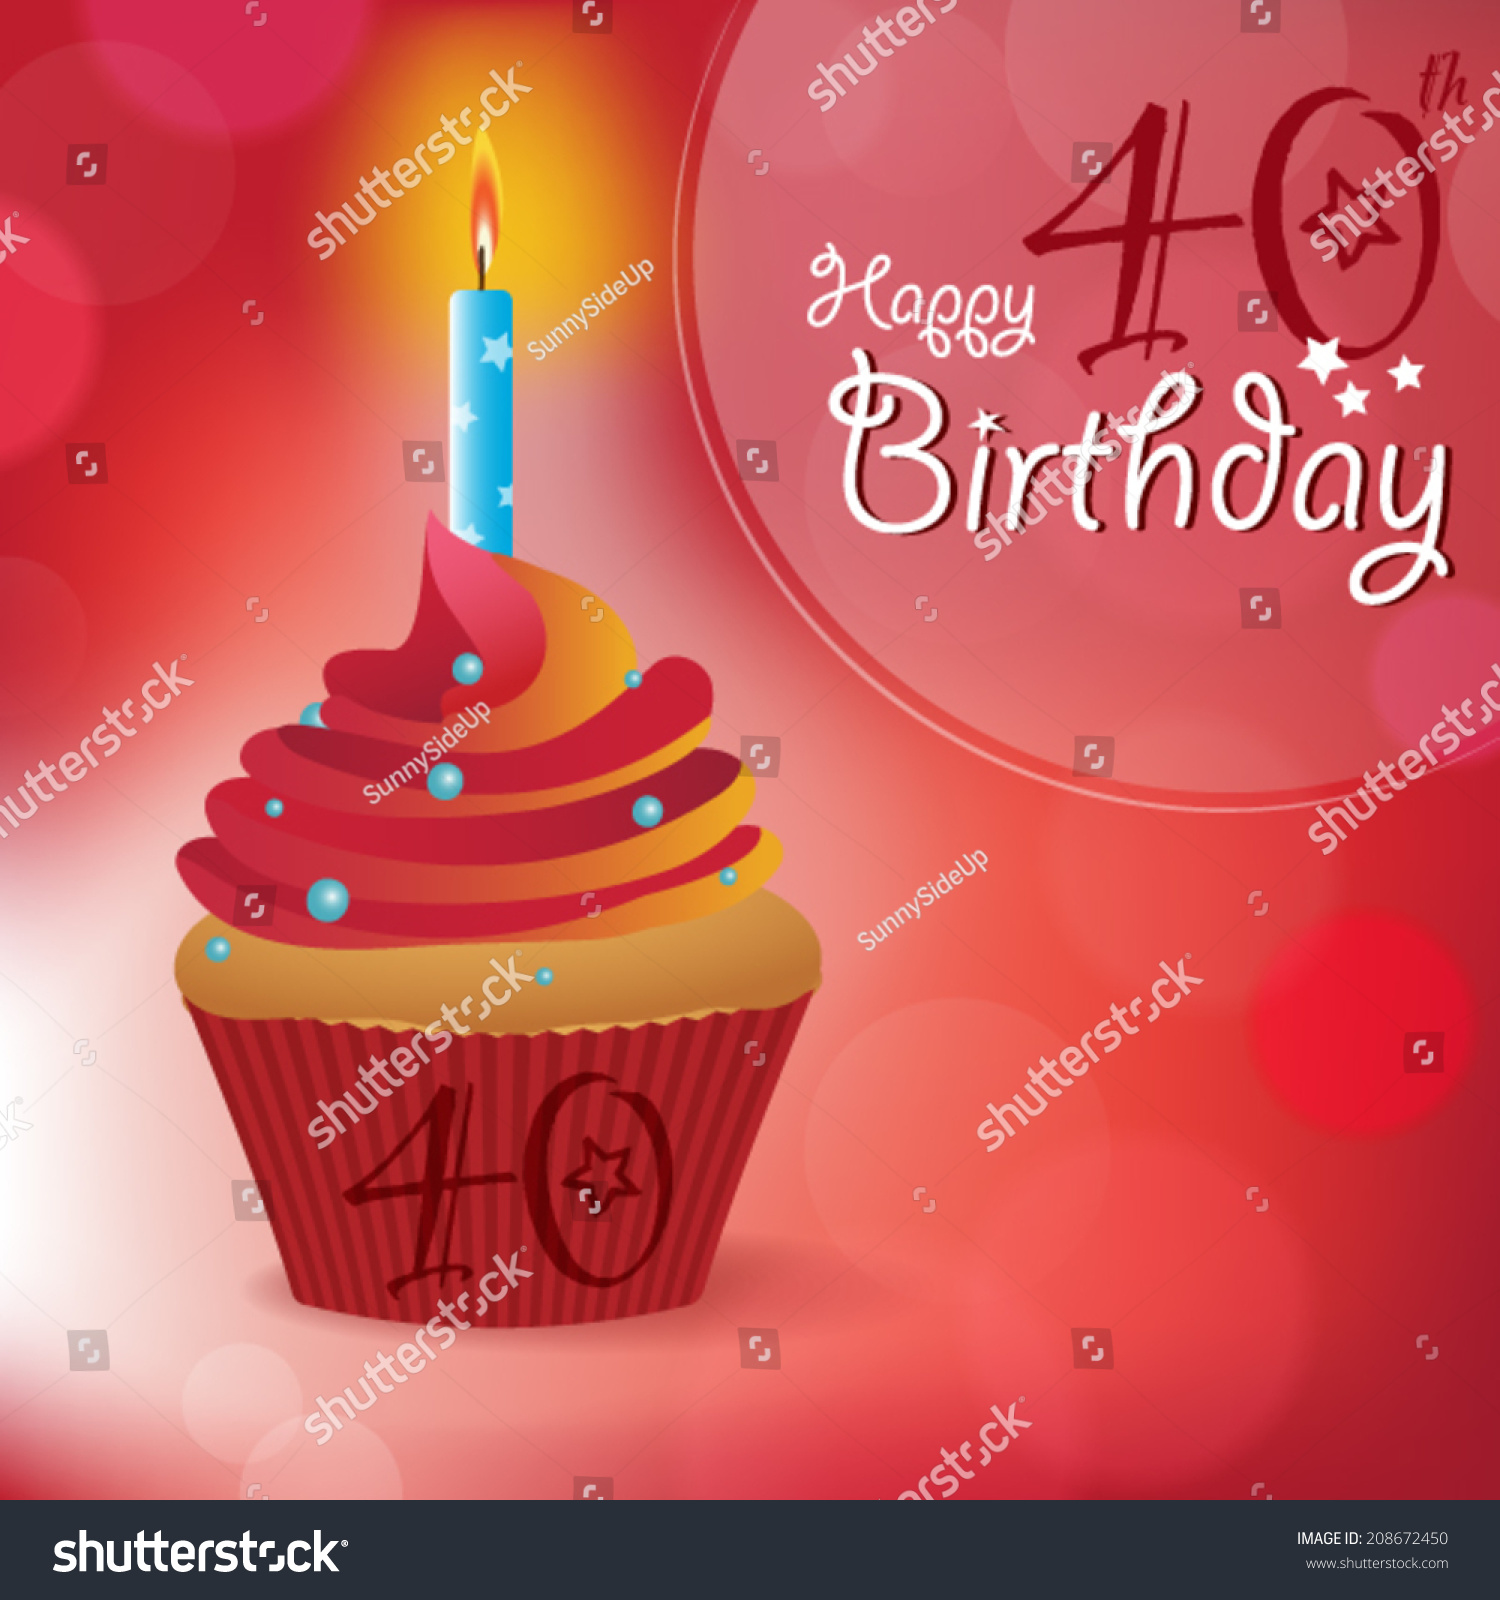 Happy 40th Birthday Greeting Invitation Message Stock Vector